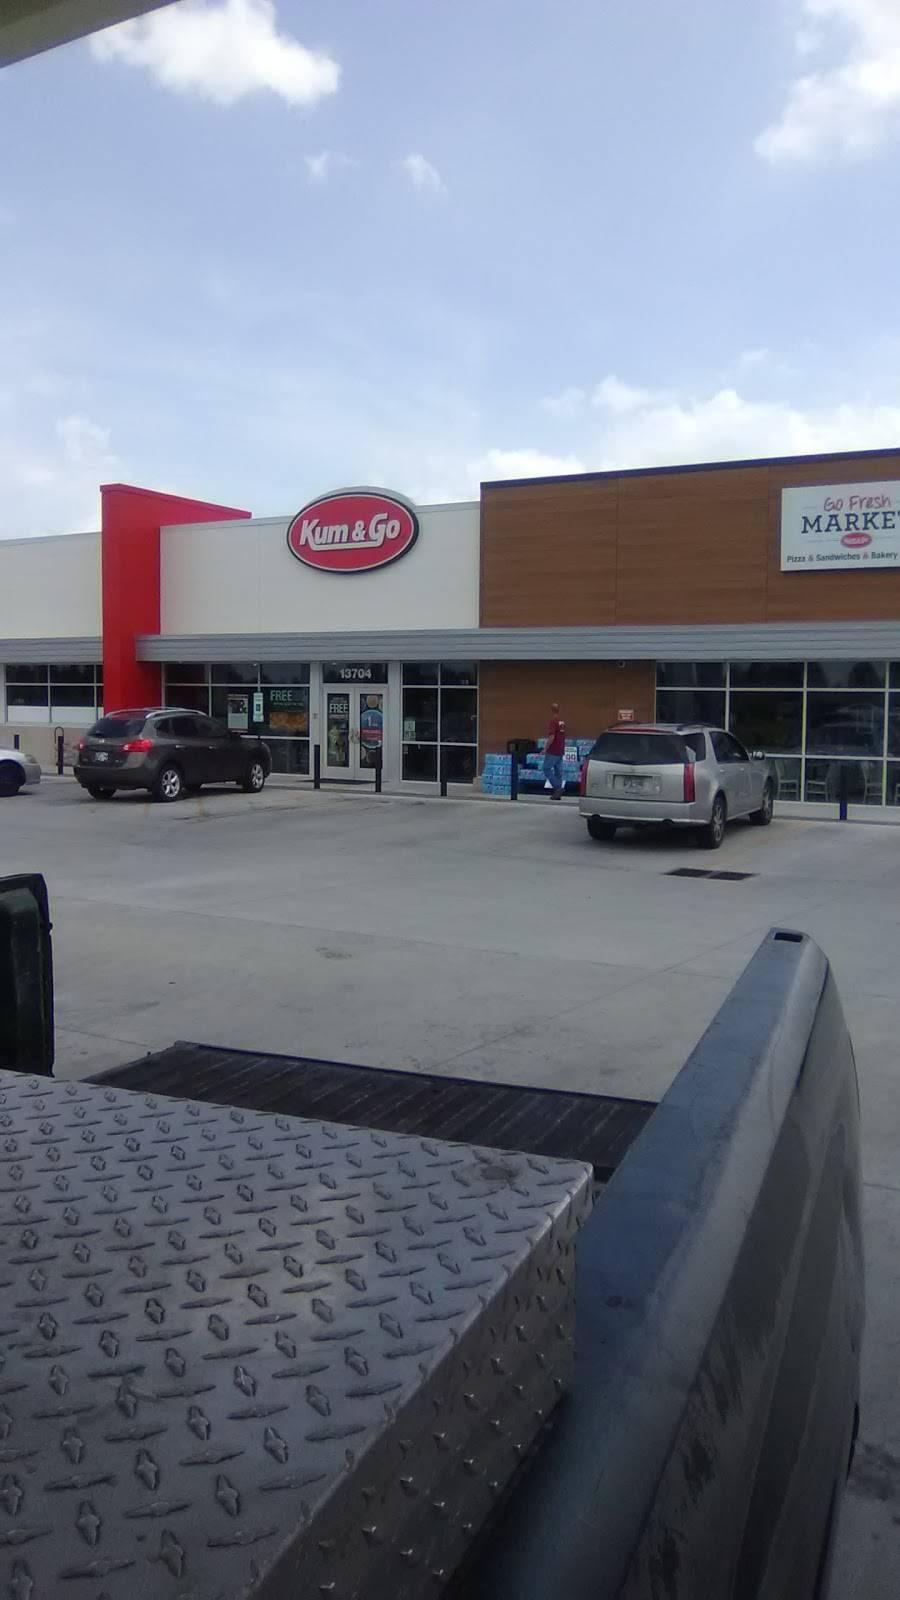 Kum & Go - convenience store  | Photo 6 of 8 | Address: 13704 E 106th St N, Owasso, OK 74055, USA | Phone: (918) 272-8661